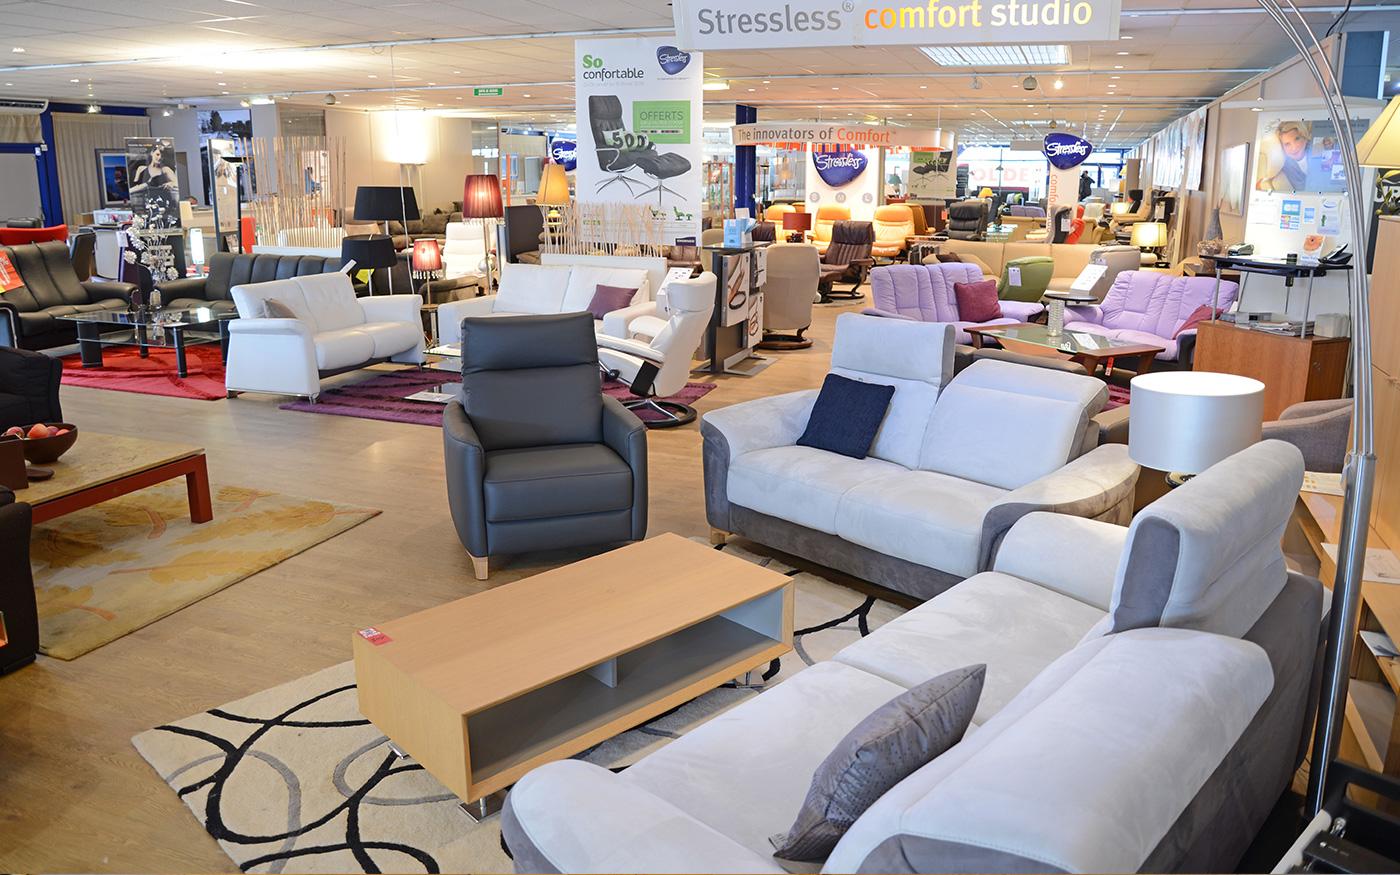 magasin de canap s et fauteuils stressless strasbourg et vendenheim. Black Bedroom Furniture Sets. Home Design Ideas